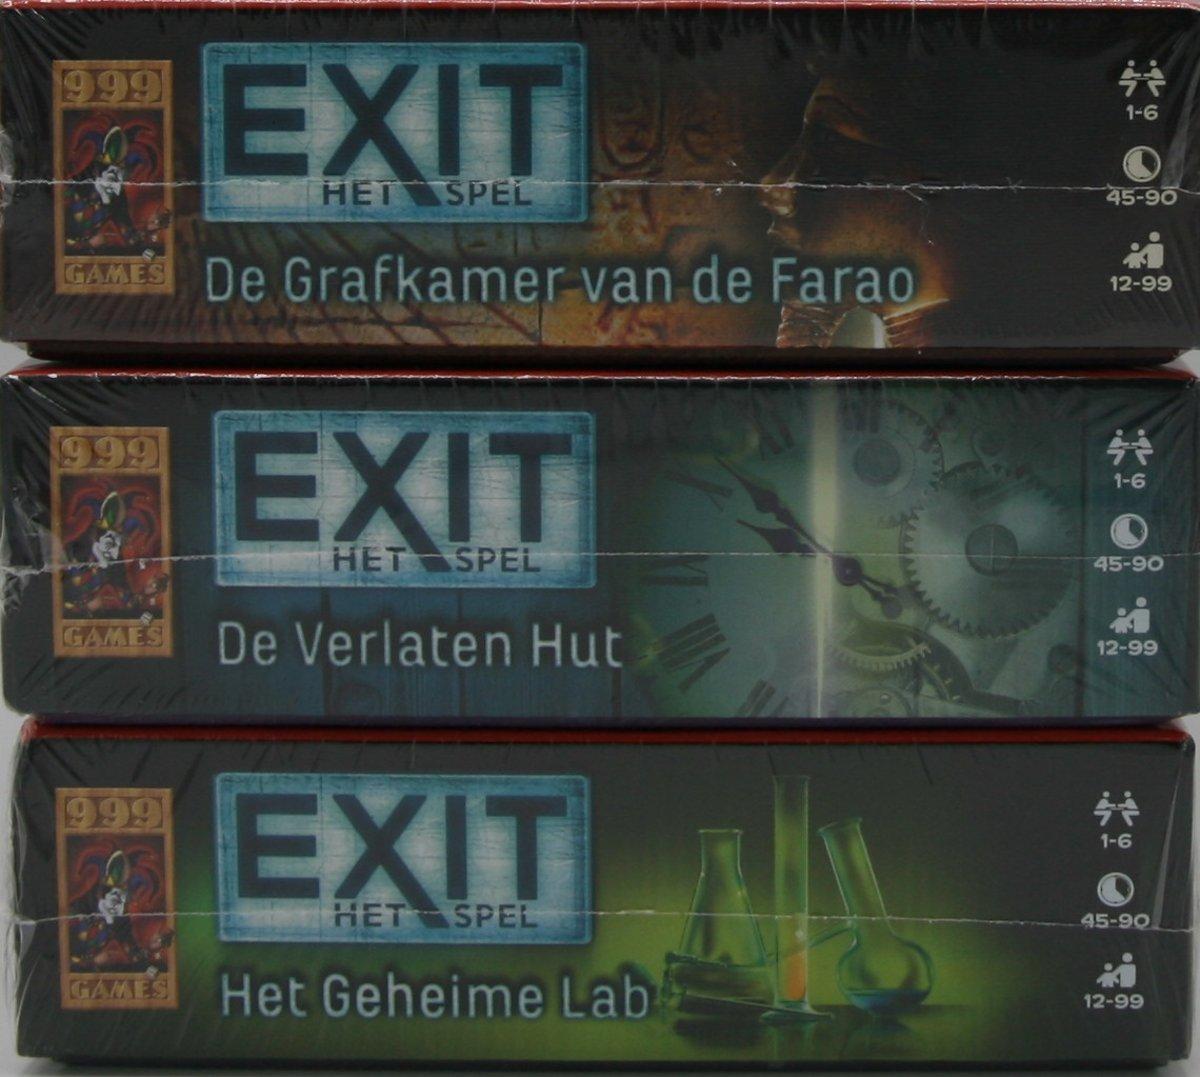 Exit pakket